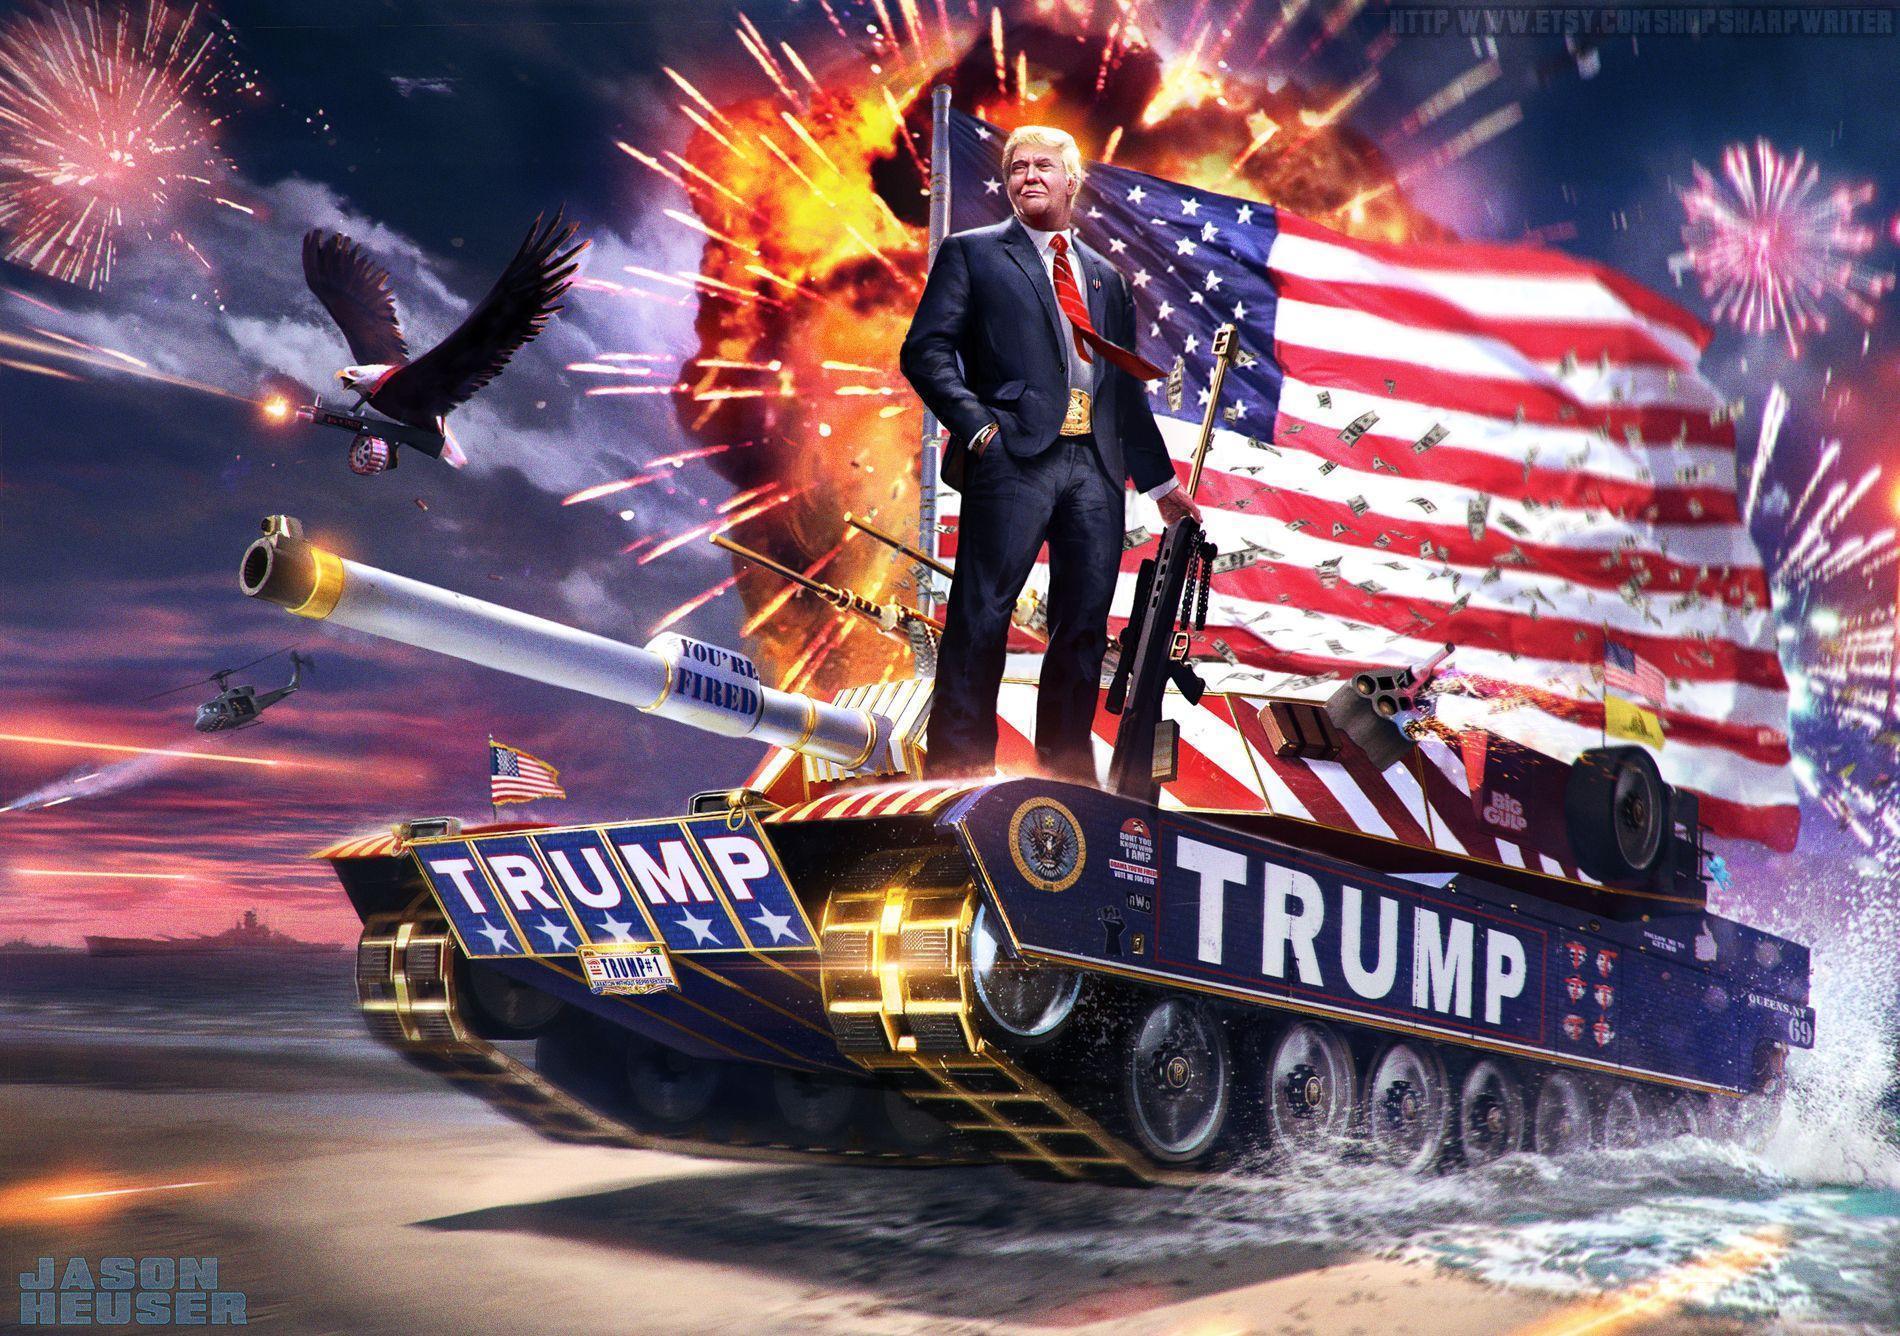 Trump 2020 Wallpapers 1900x1336